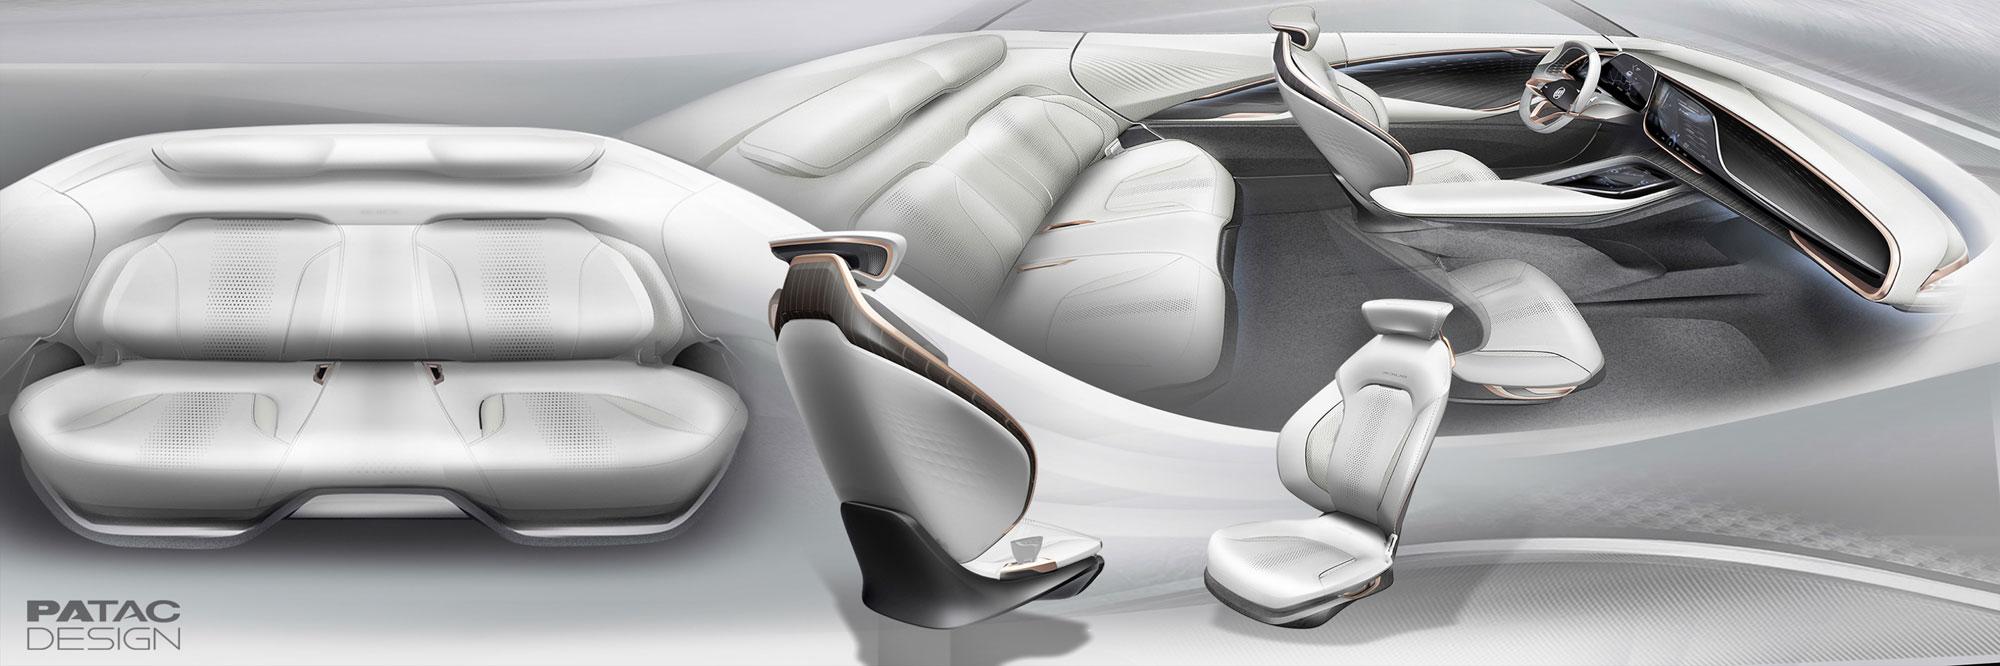 buick-enspire-concept-interior-sketches